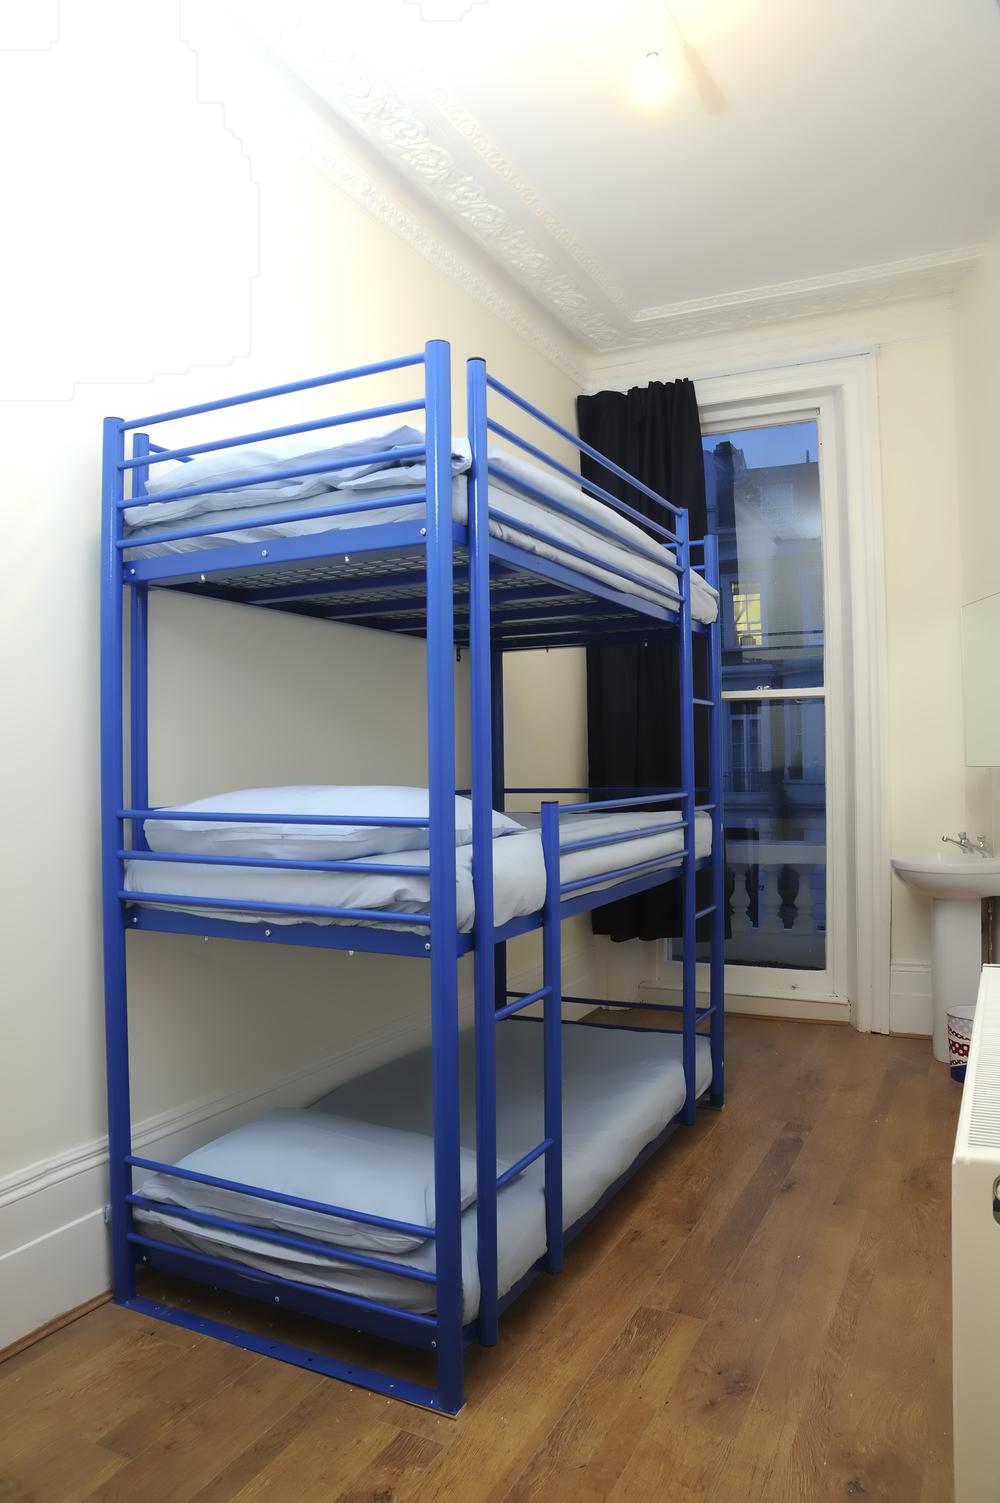 Disco bed cam o bunk disco bed cam o bunk bed with 2 - Porta rivera hostel ...